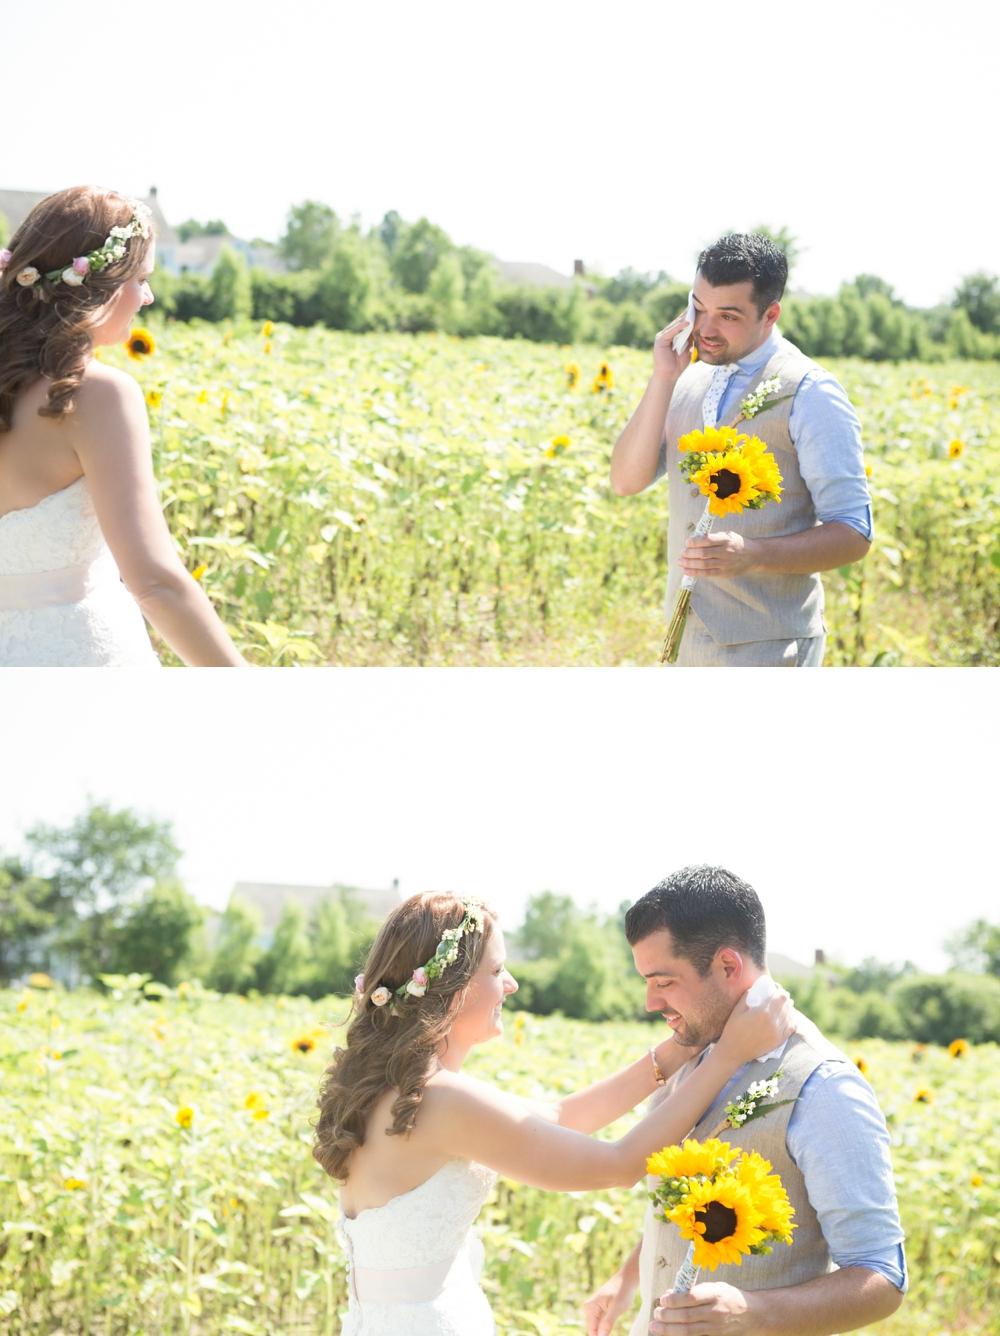 GreenvaleVineyards_Wedding_Missy&Joe_0009.jpg